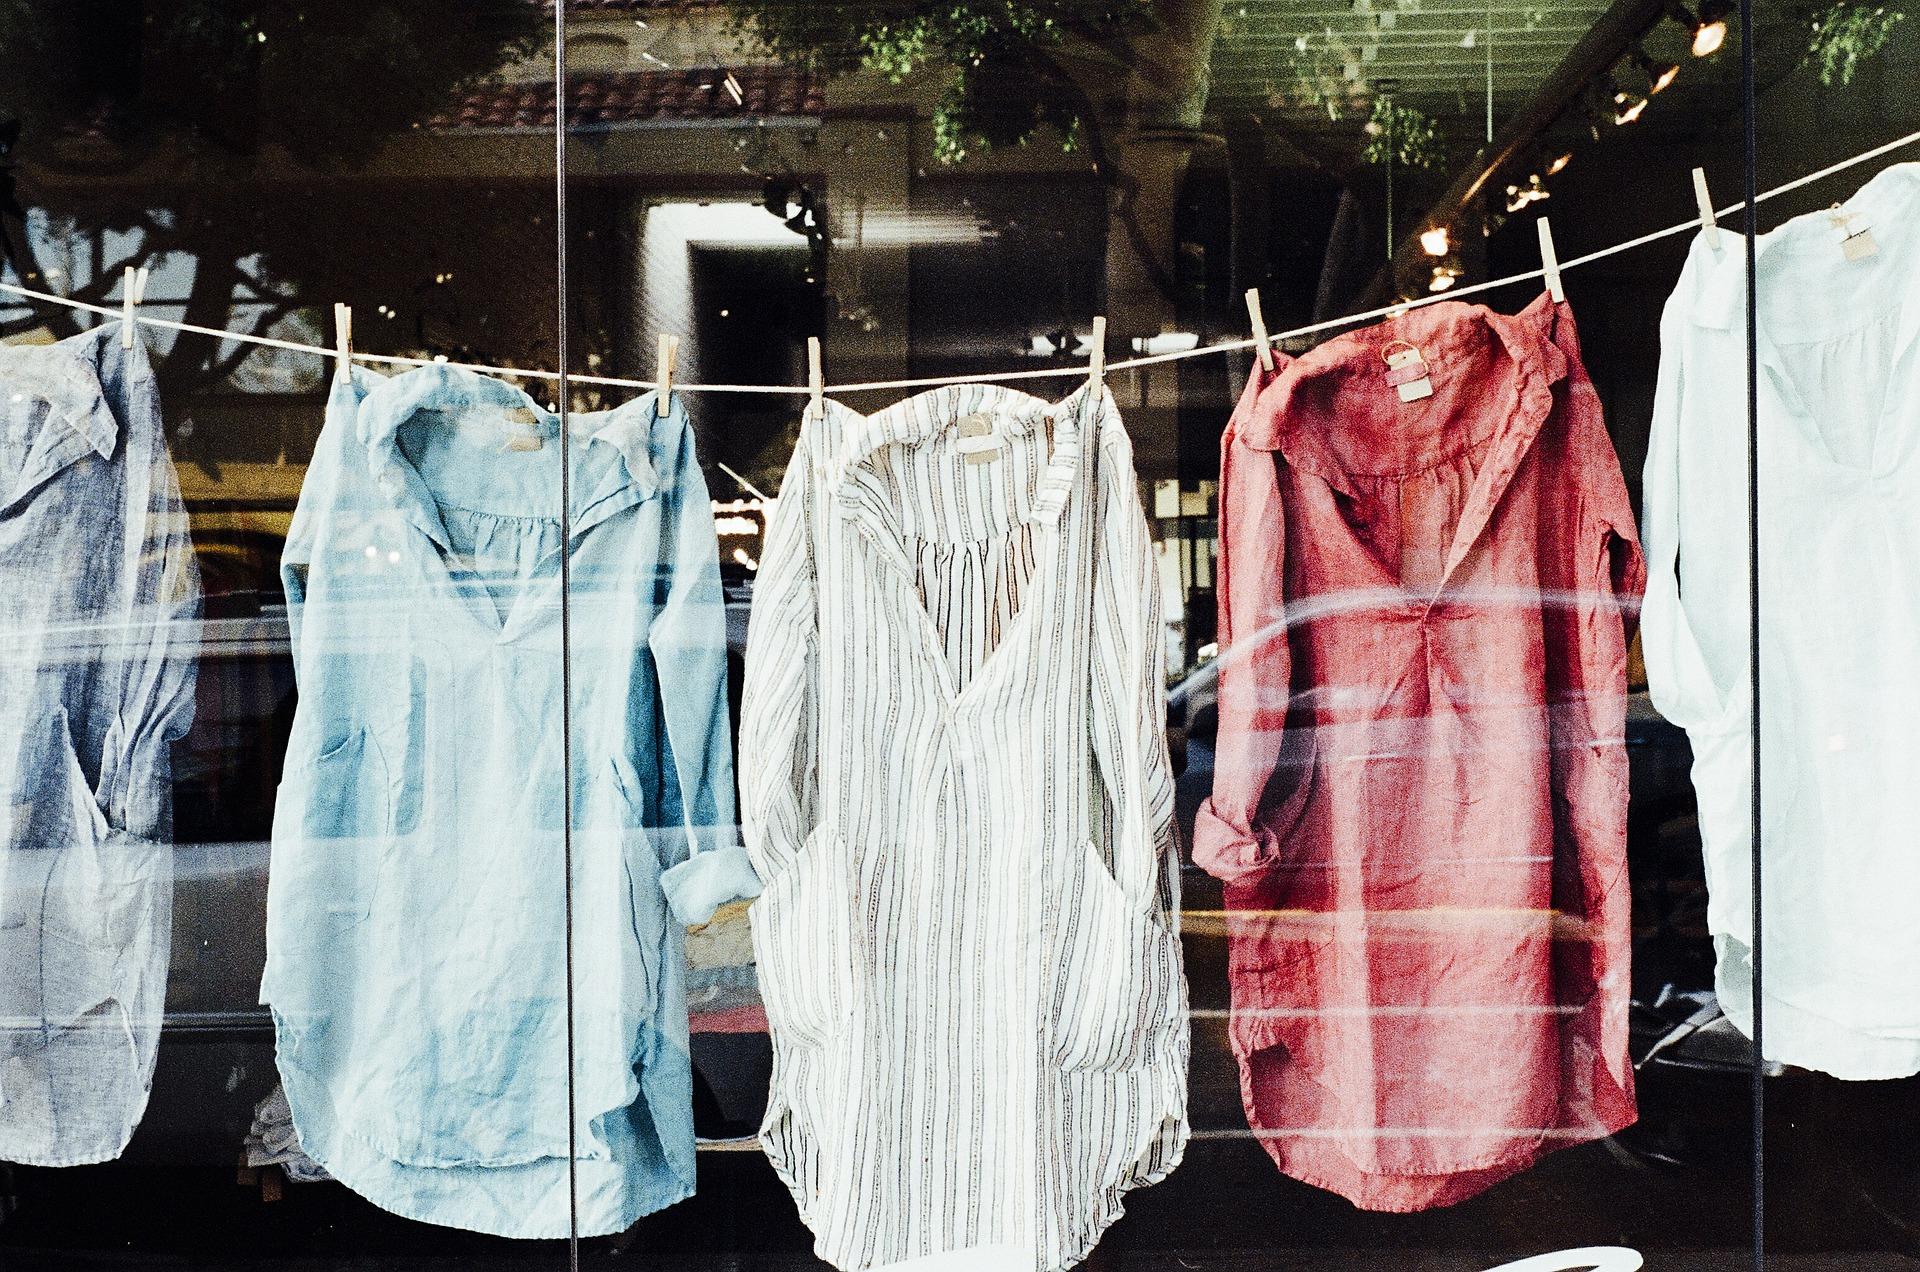 laundry-405878_1920